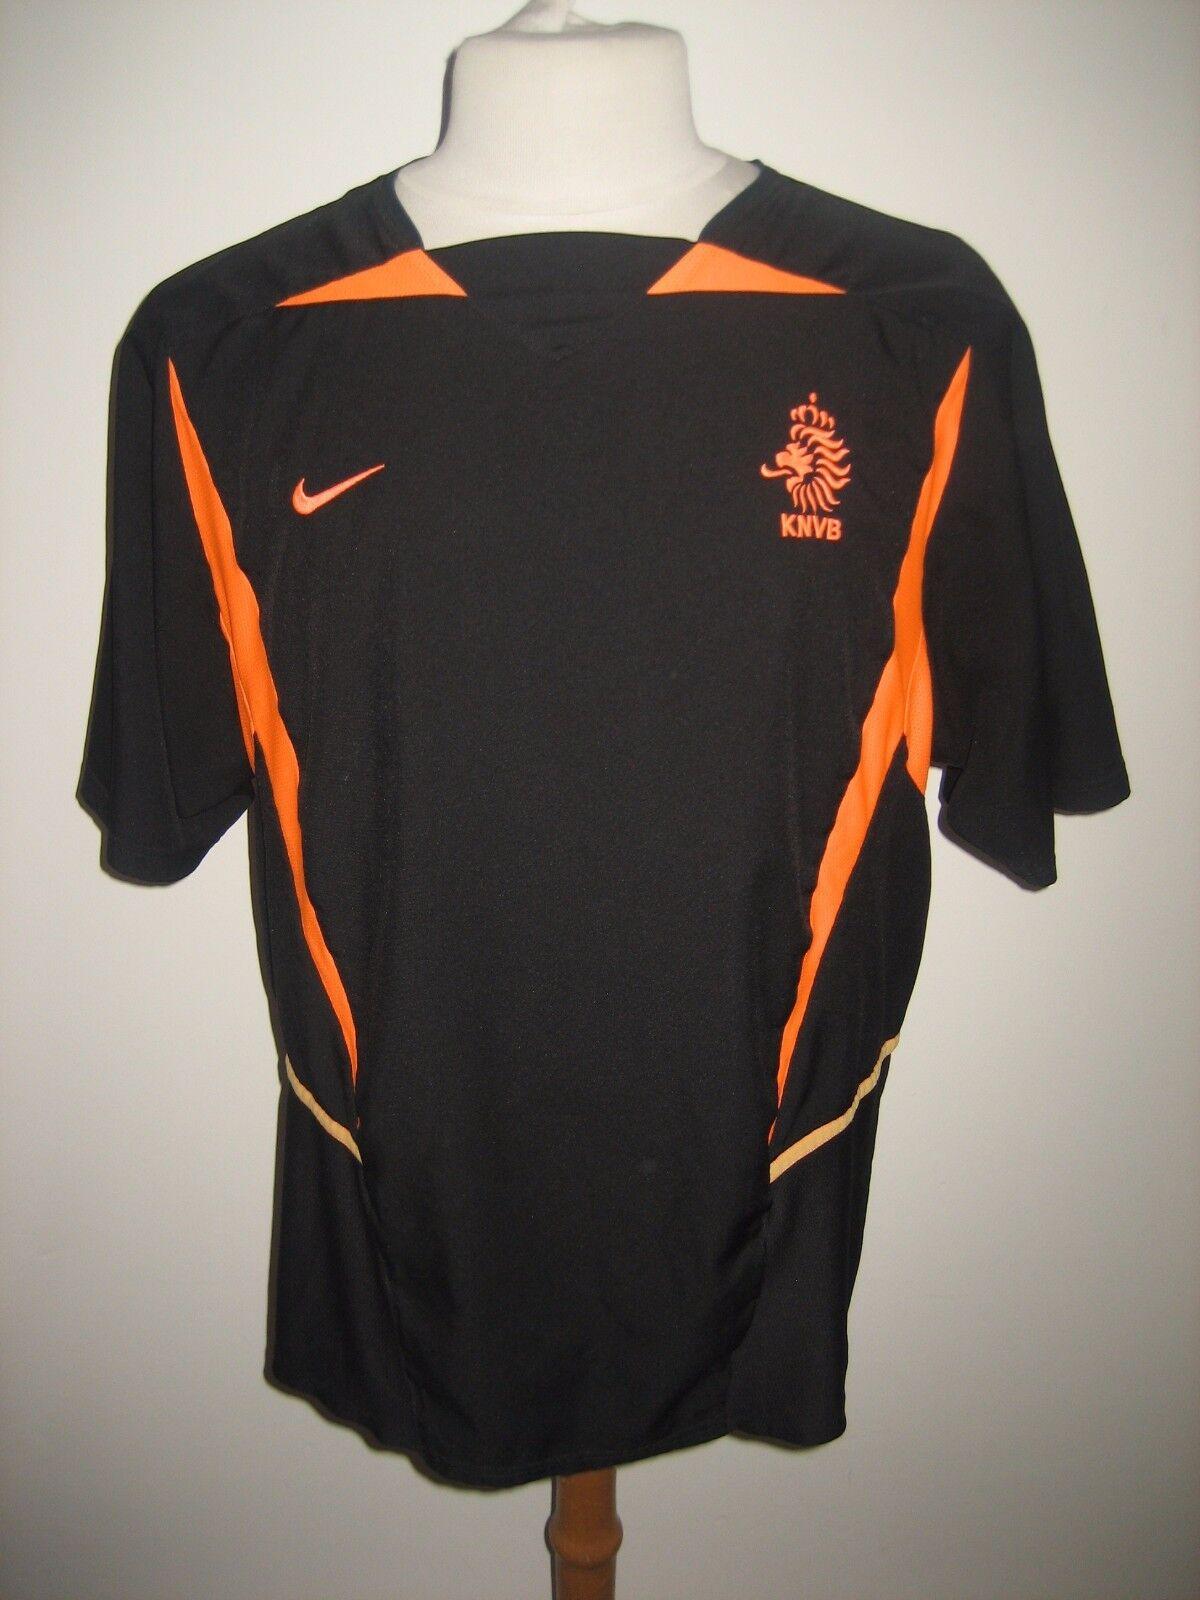 Holland away knvb Fußballshirt Fußball Trikot voetbal maillot trikot Größe L